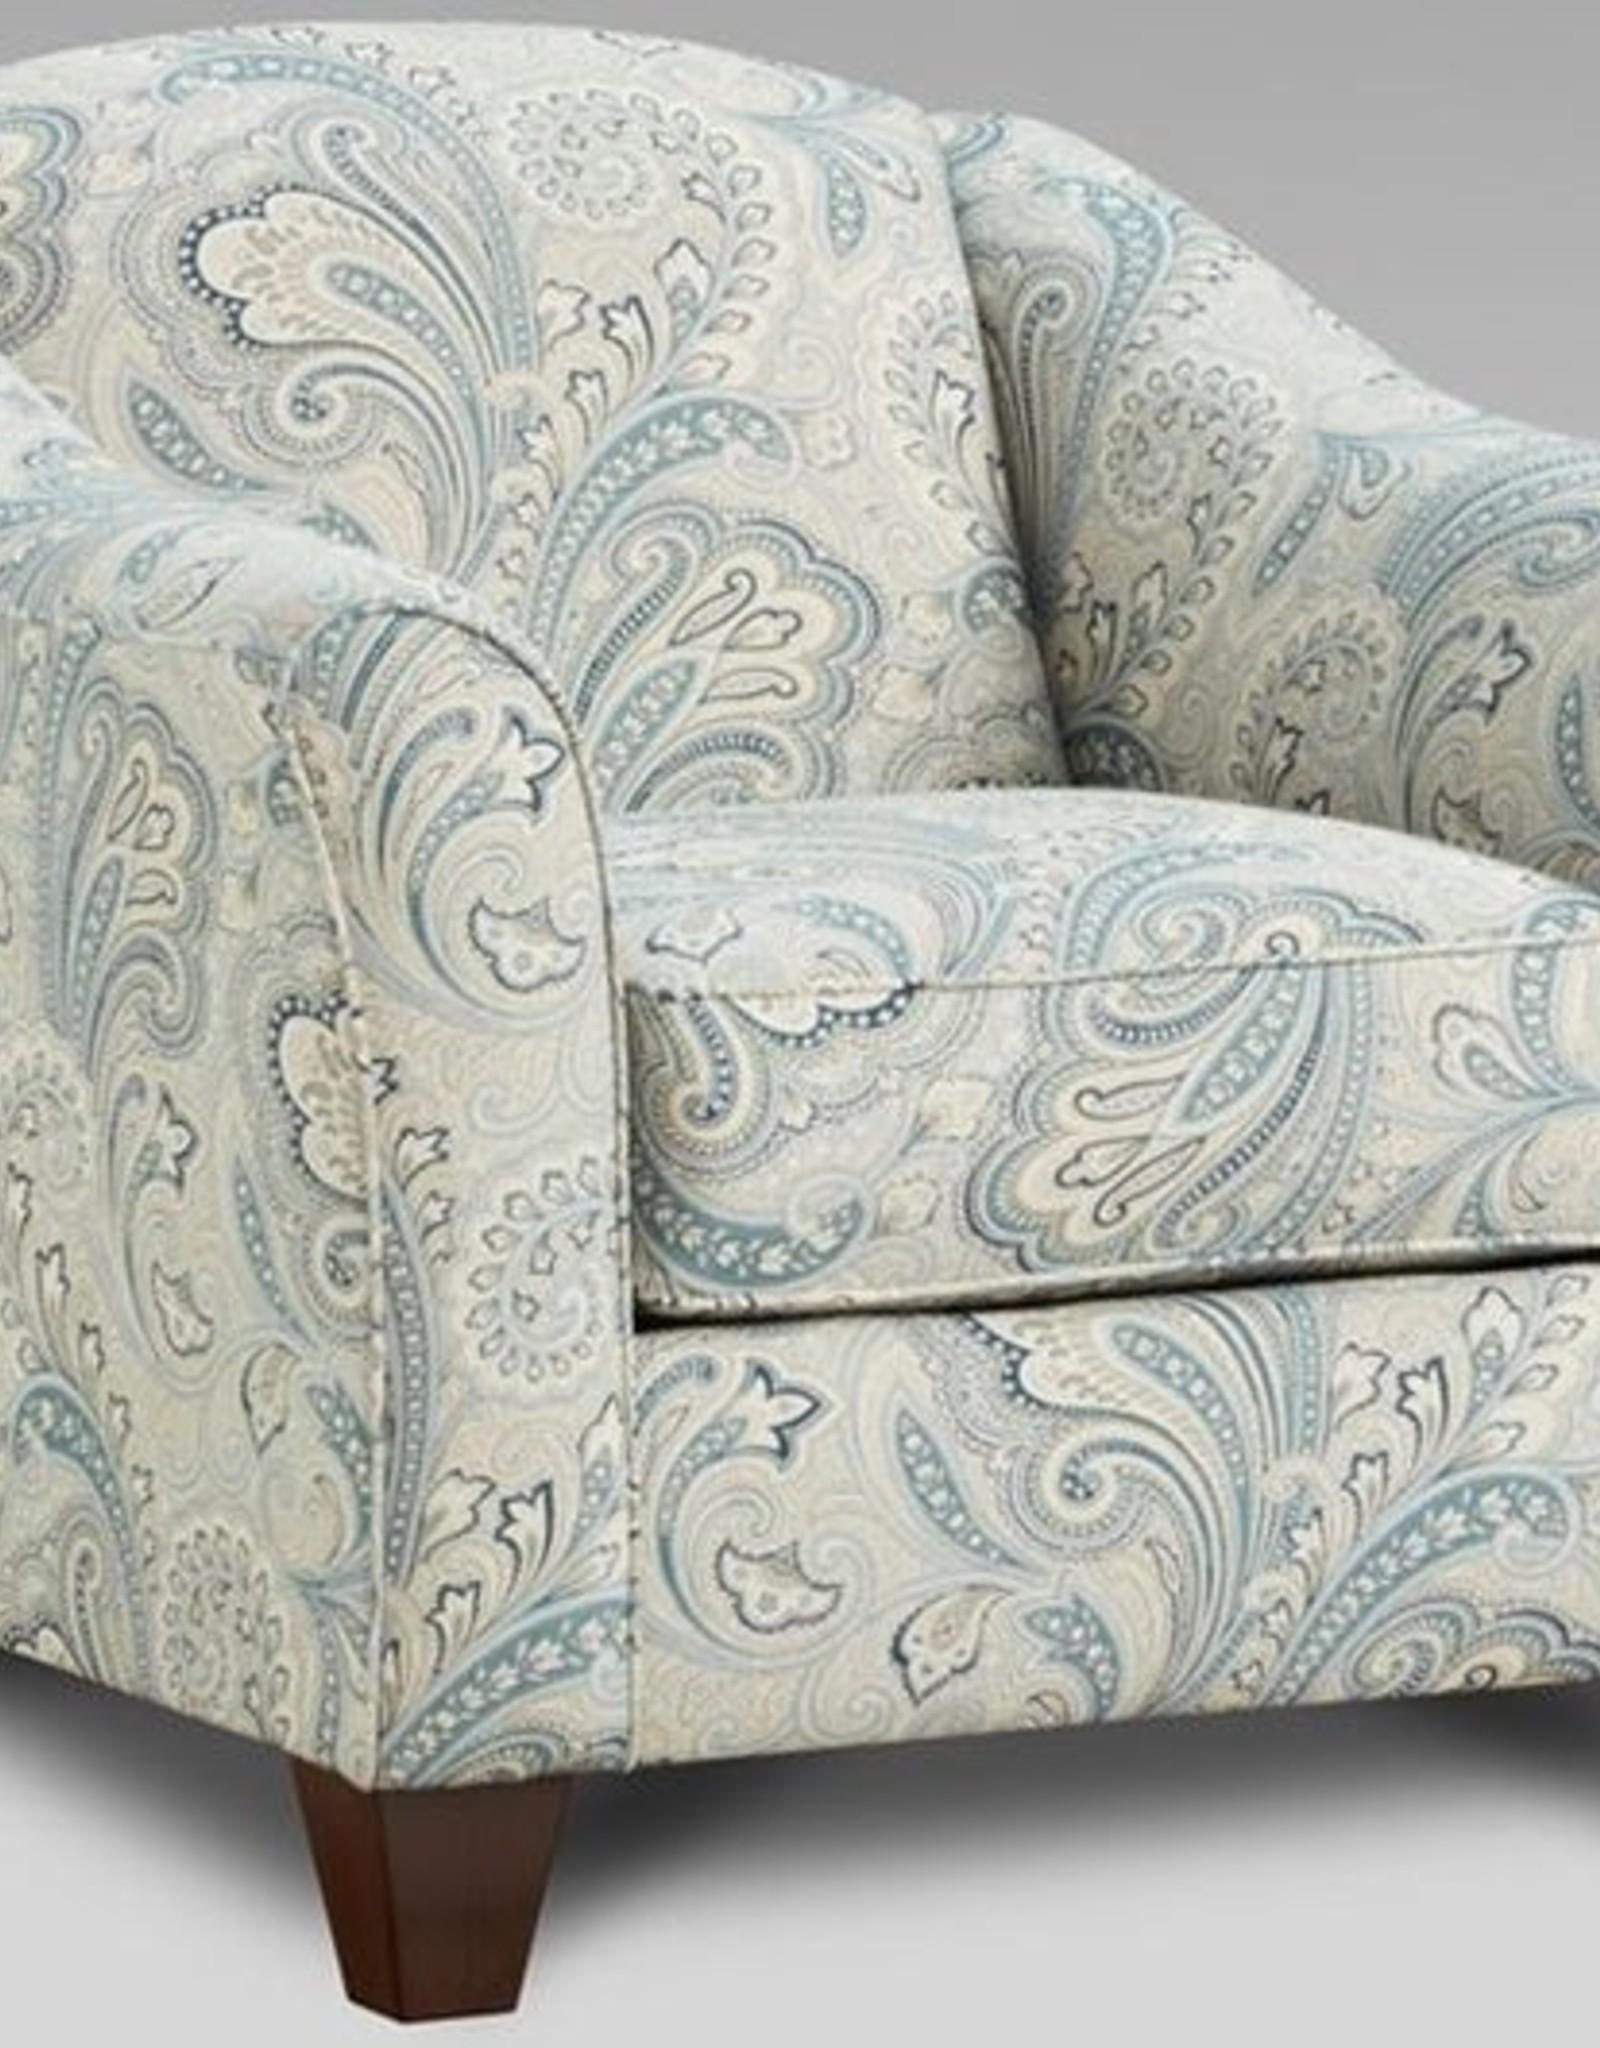 Affordable Furniture Barilla Denim Chair